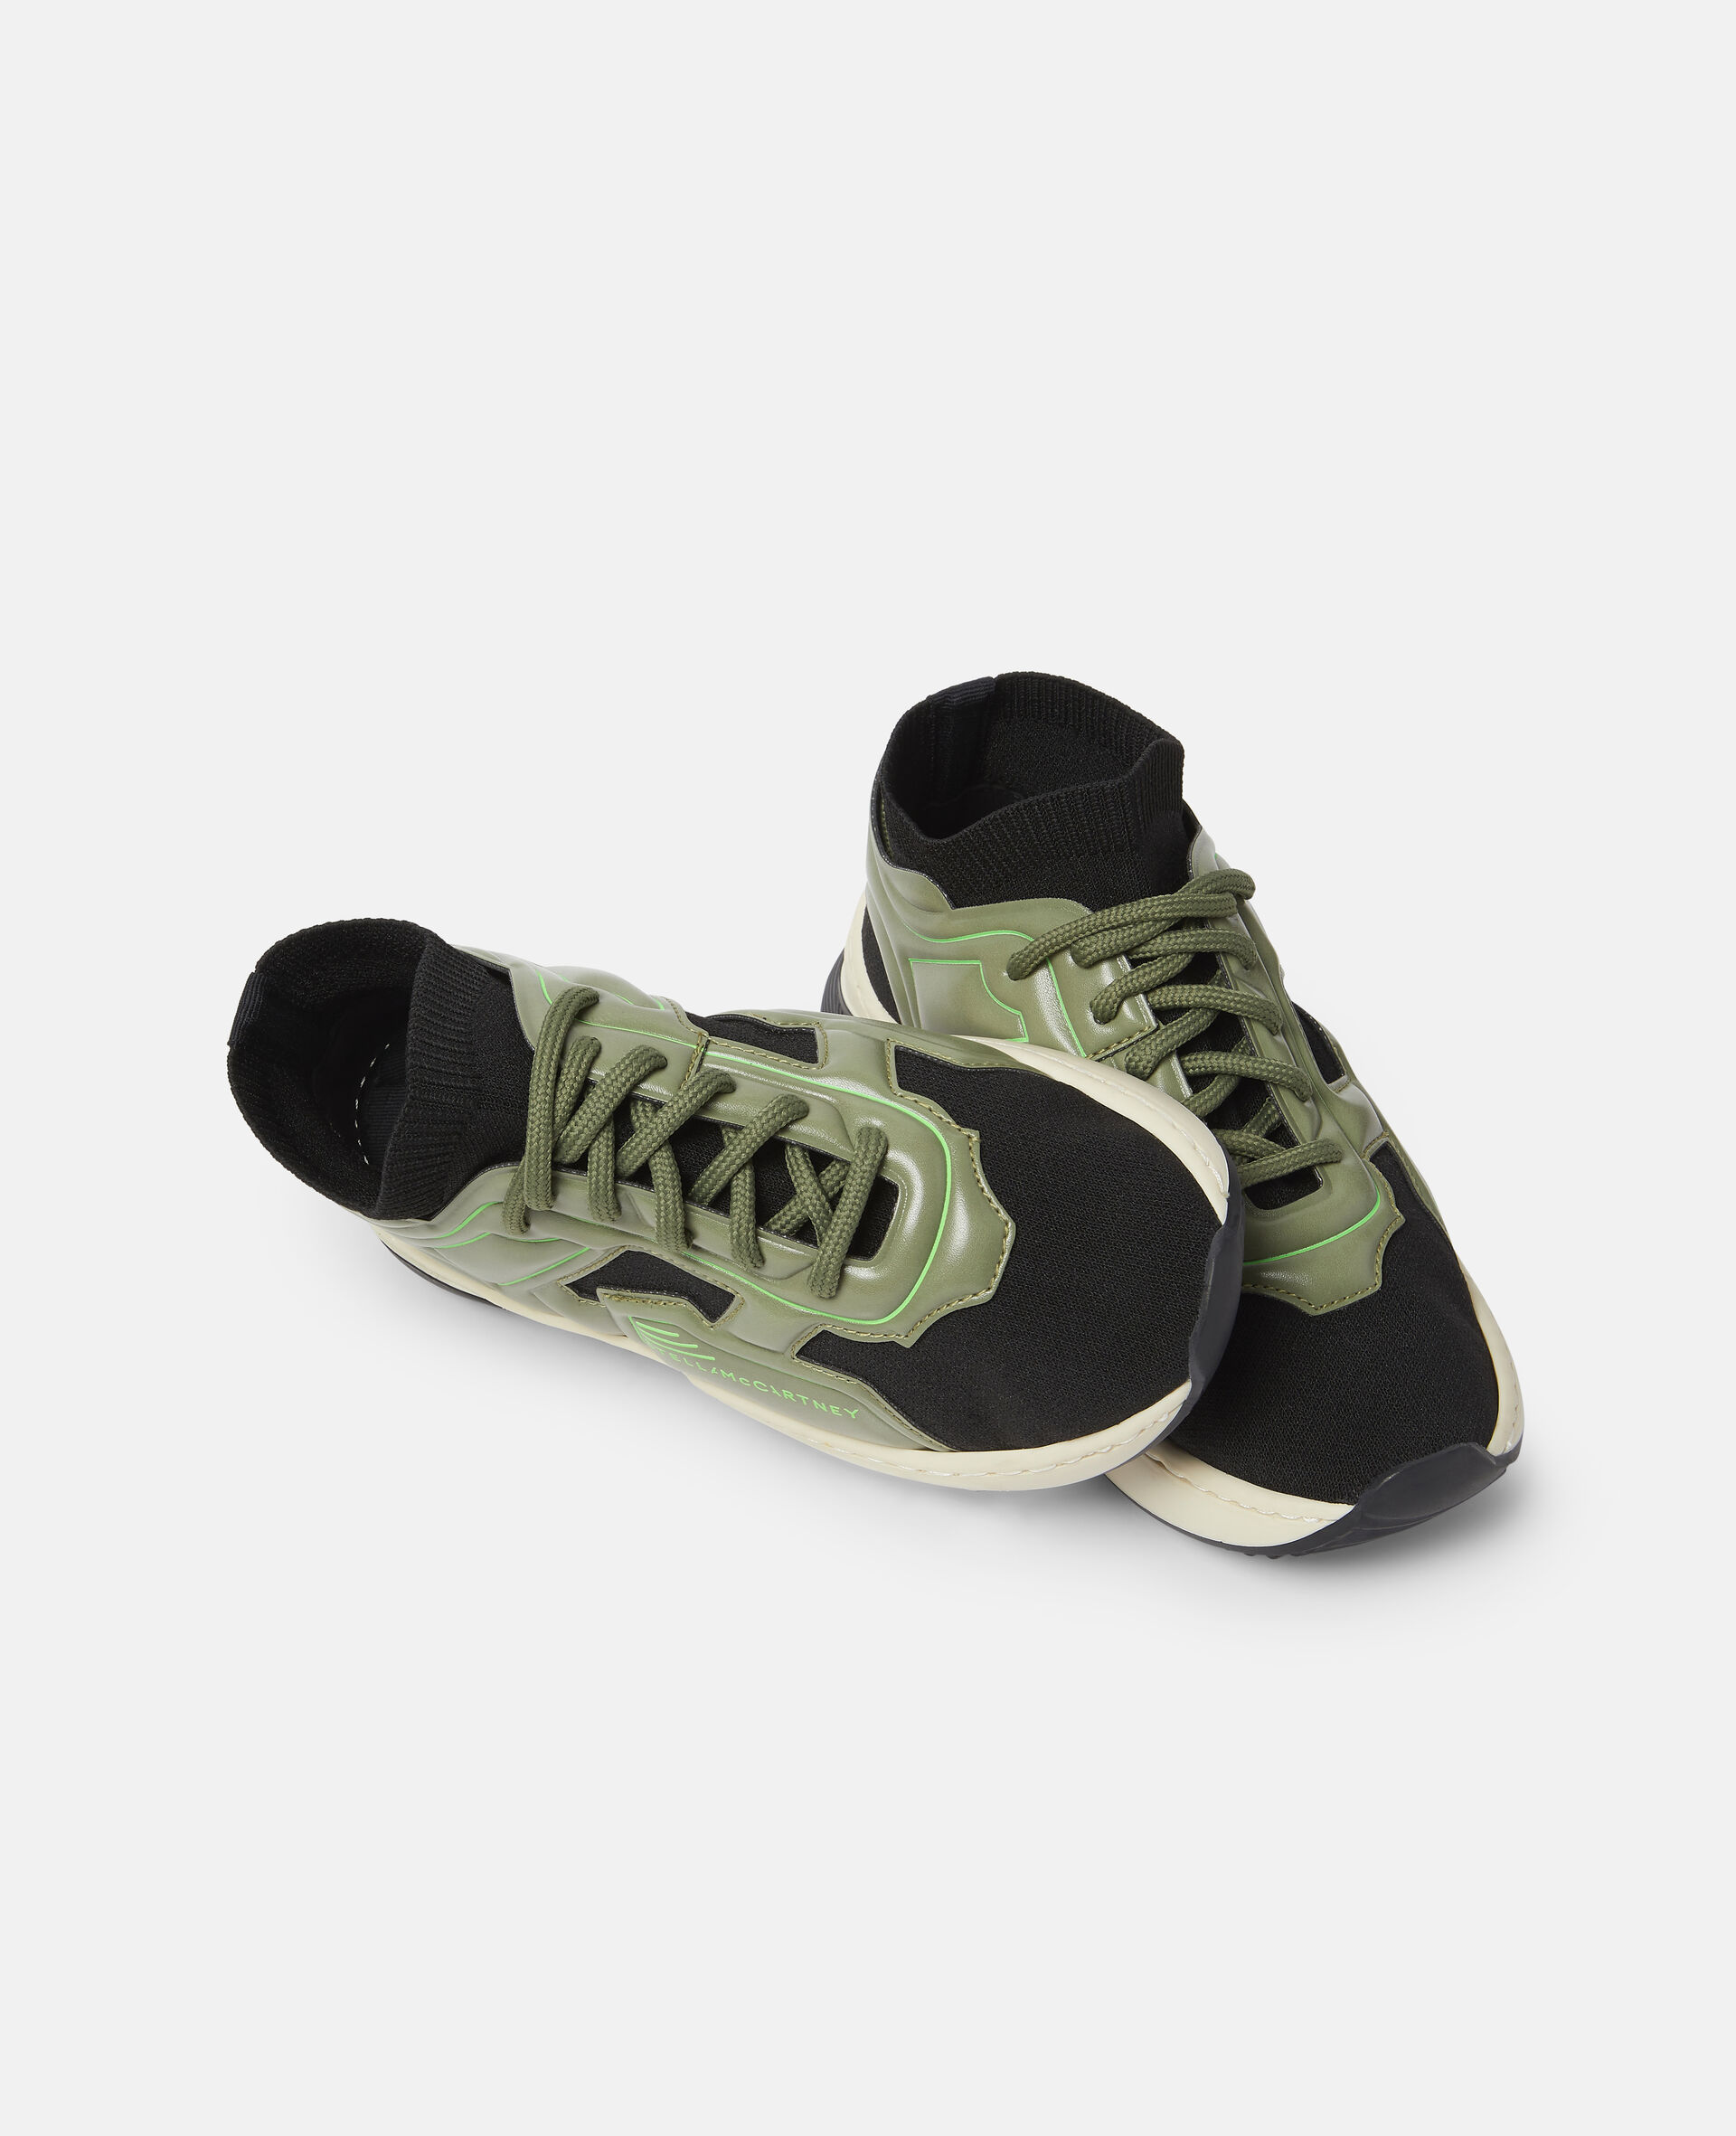 Knit Sock Sport Sneakers-Black-large image number 1